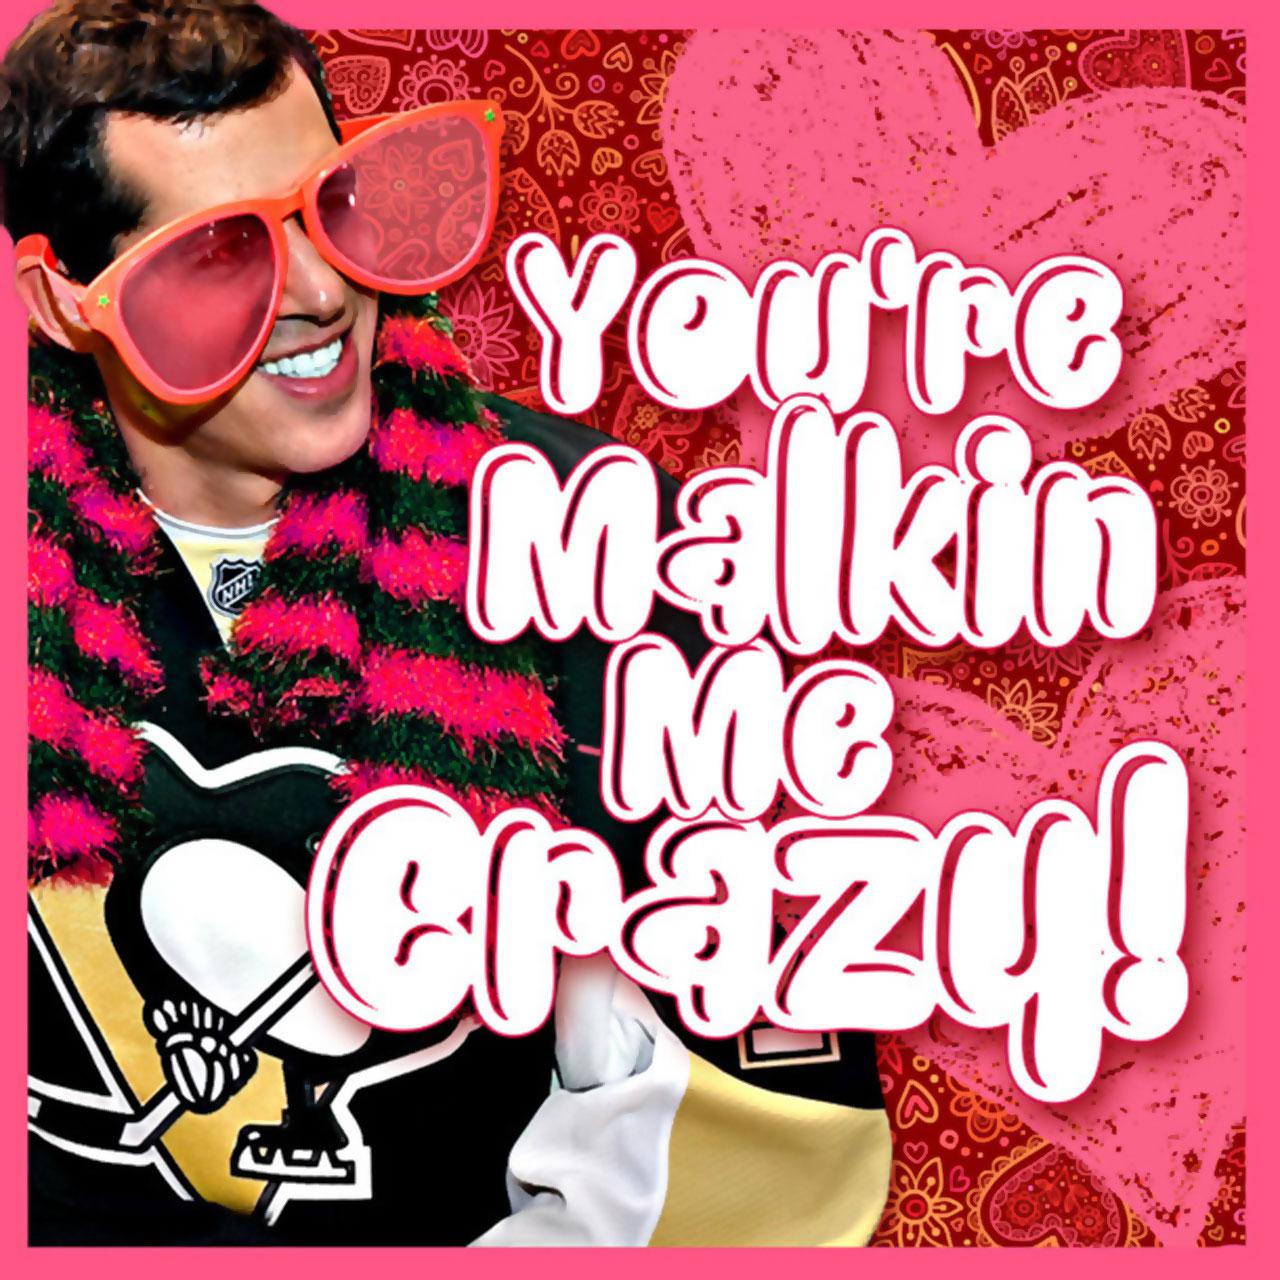 Evgeni Malkin Valentine's Day card